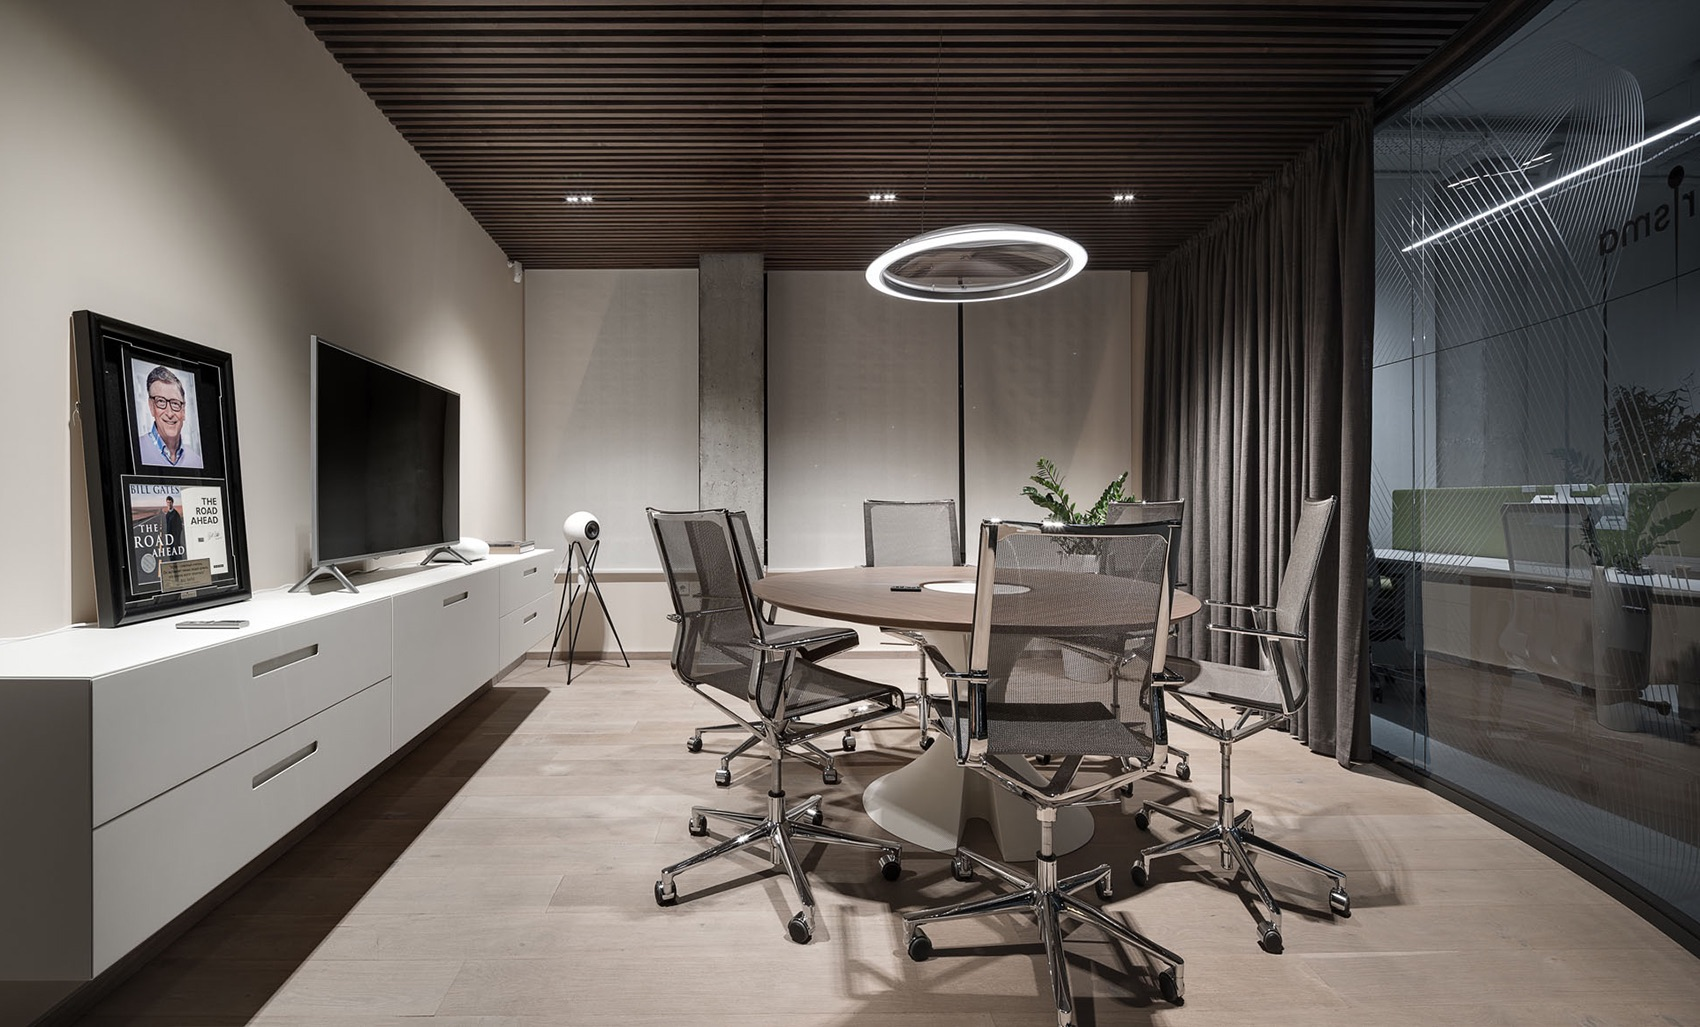 biosphere-corporation-office-9